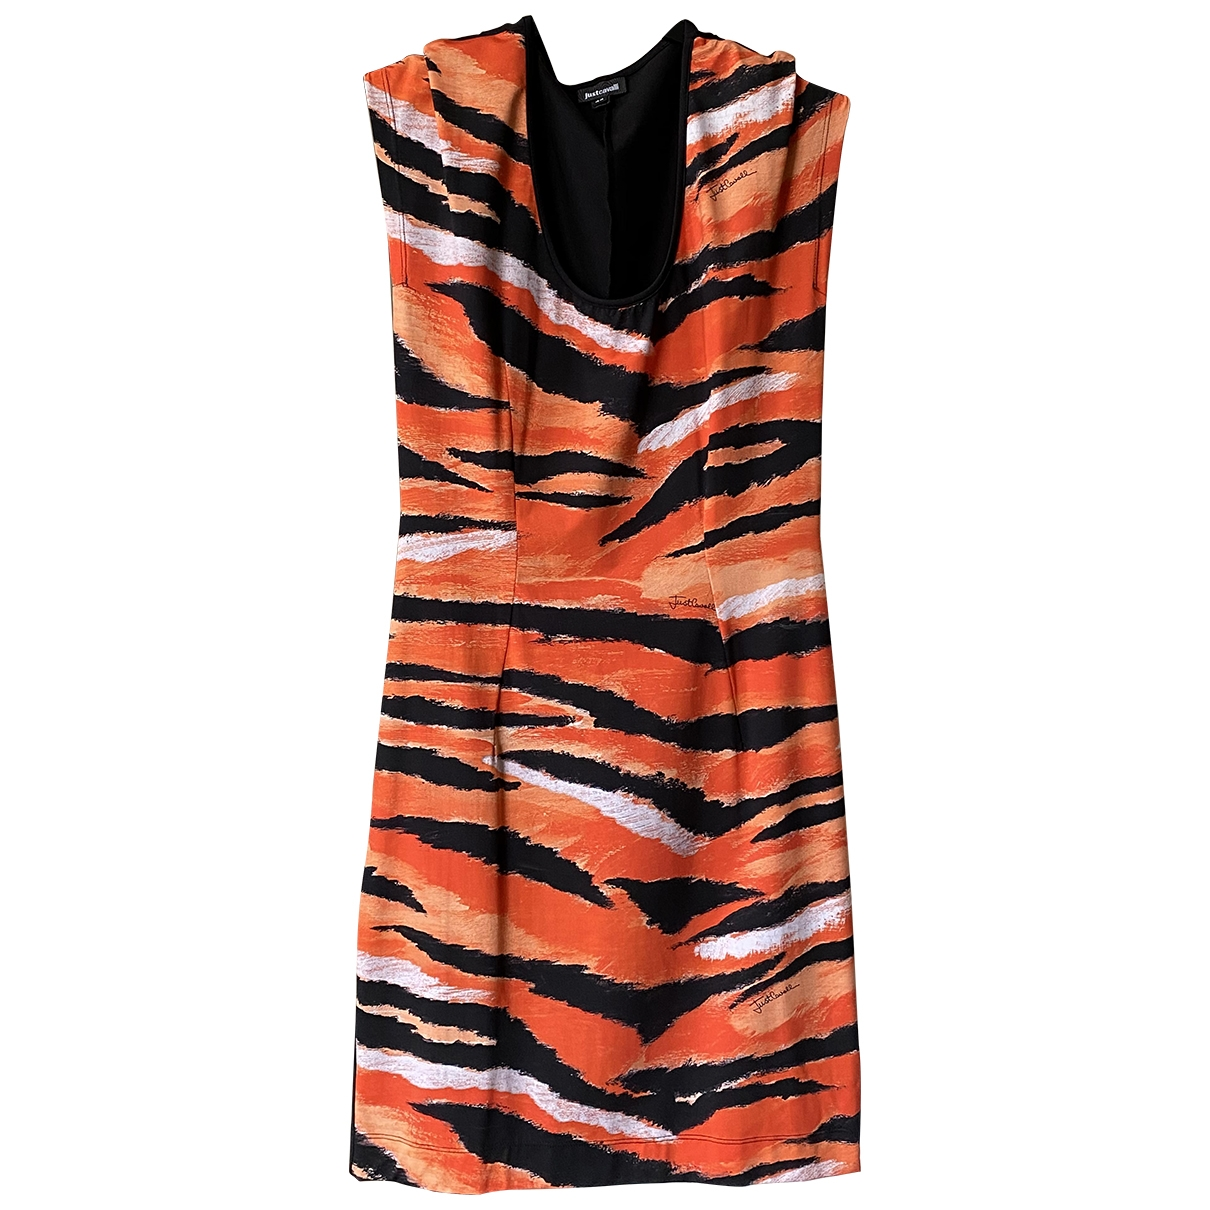 Just Cavalli \N Orange dress for Women 44 IT